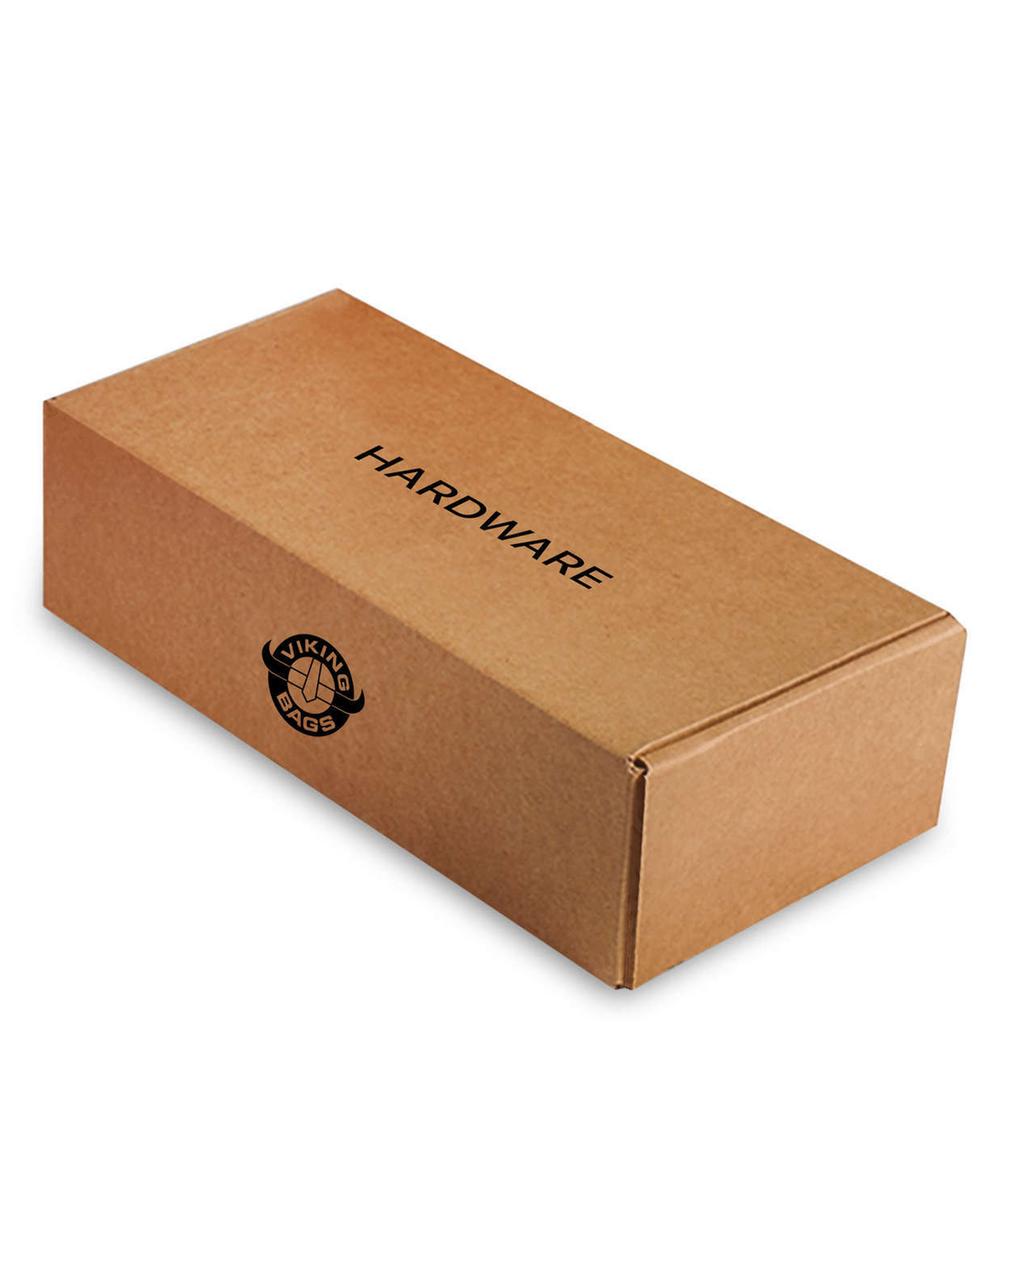 Yamaha Silverado SS Medium Slanted Studded Bags Box